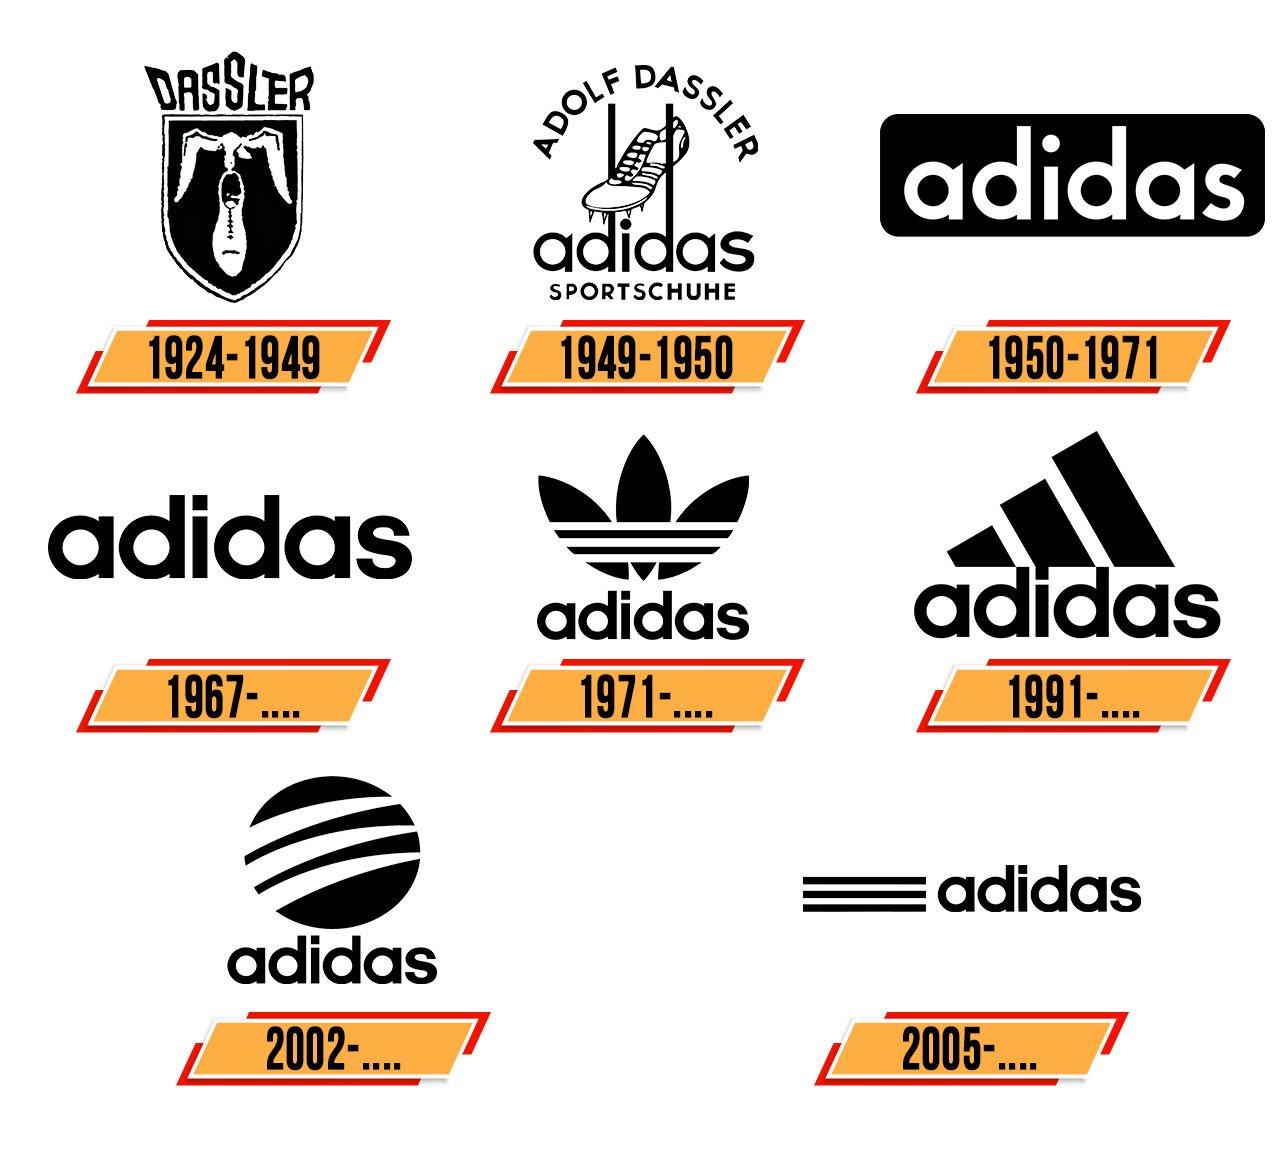 Adidas Geschichte